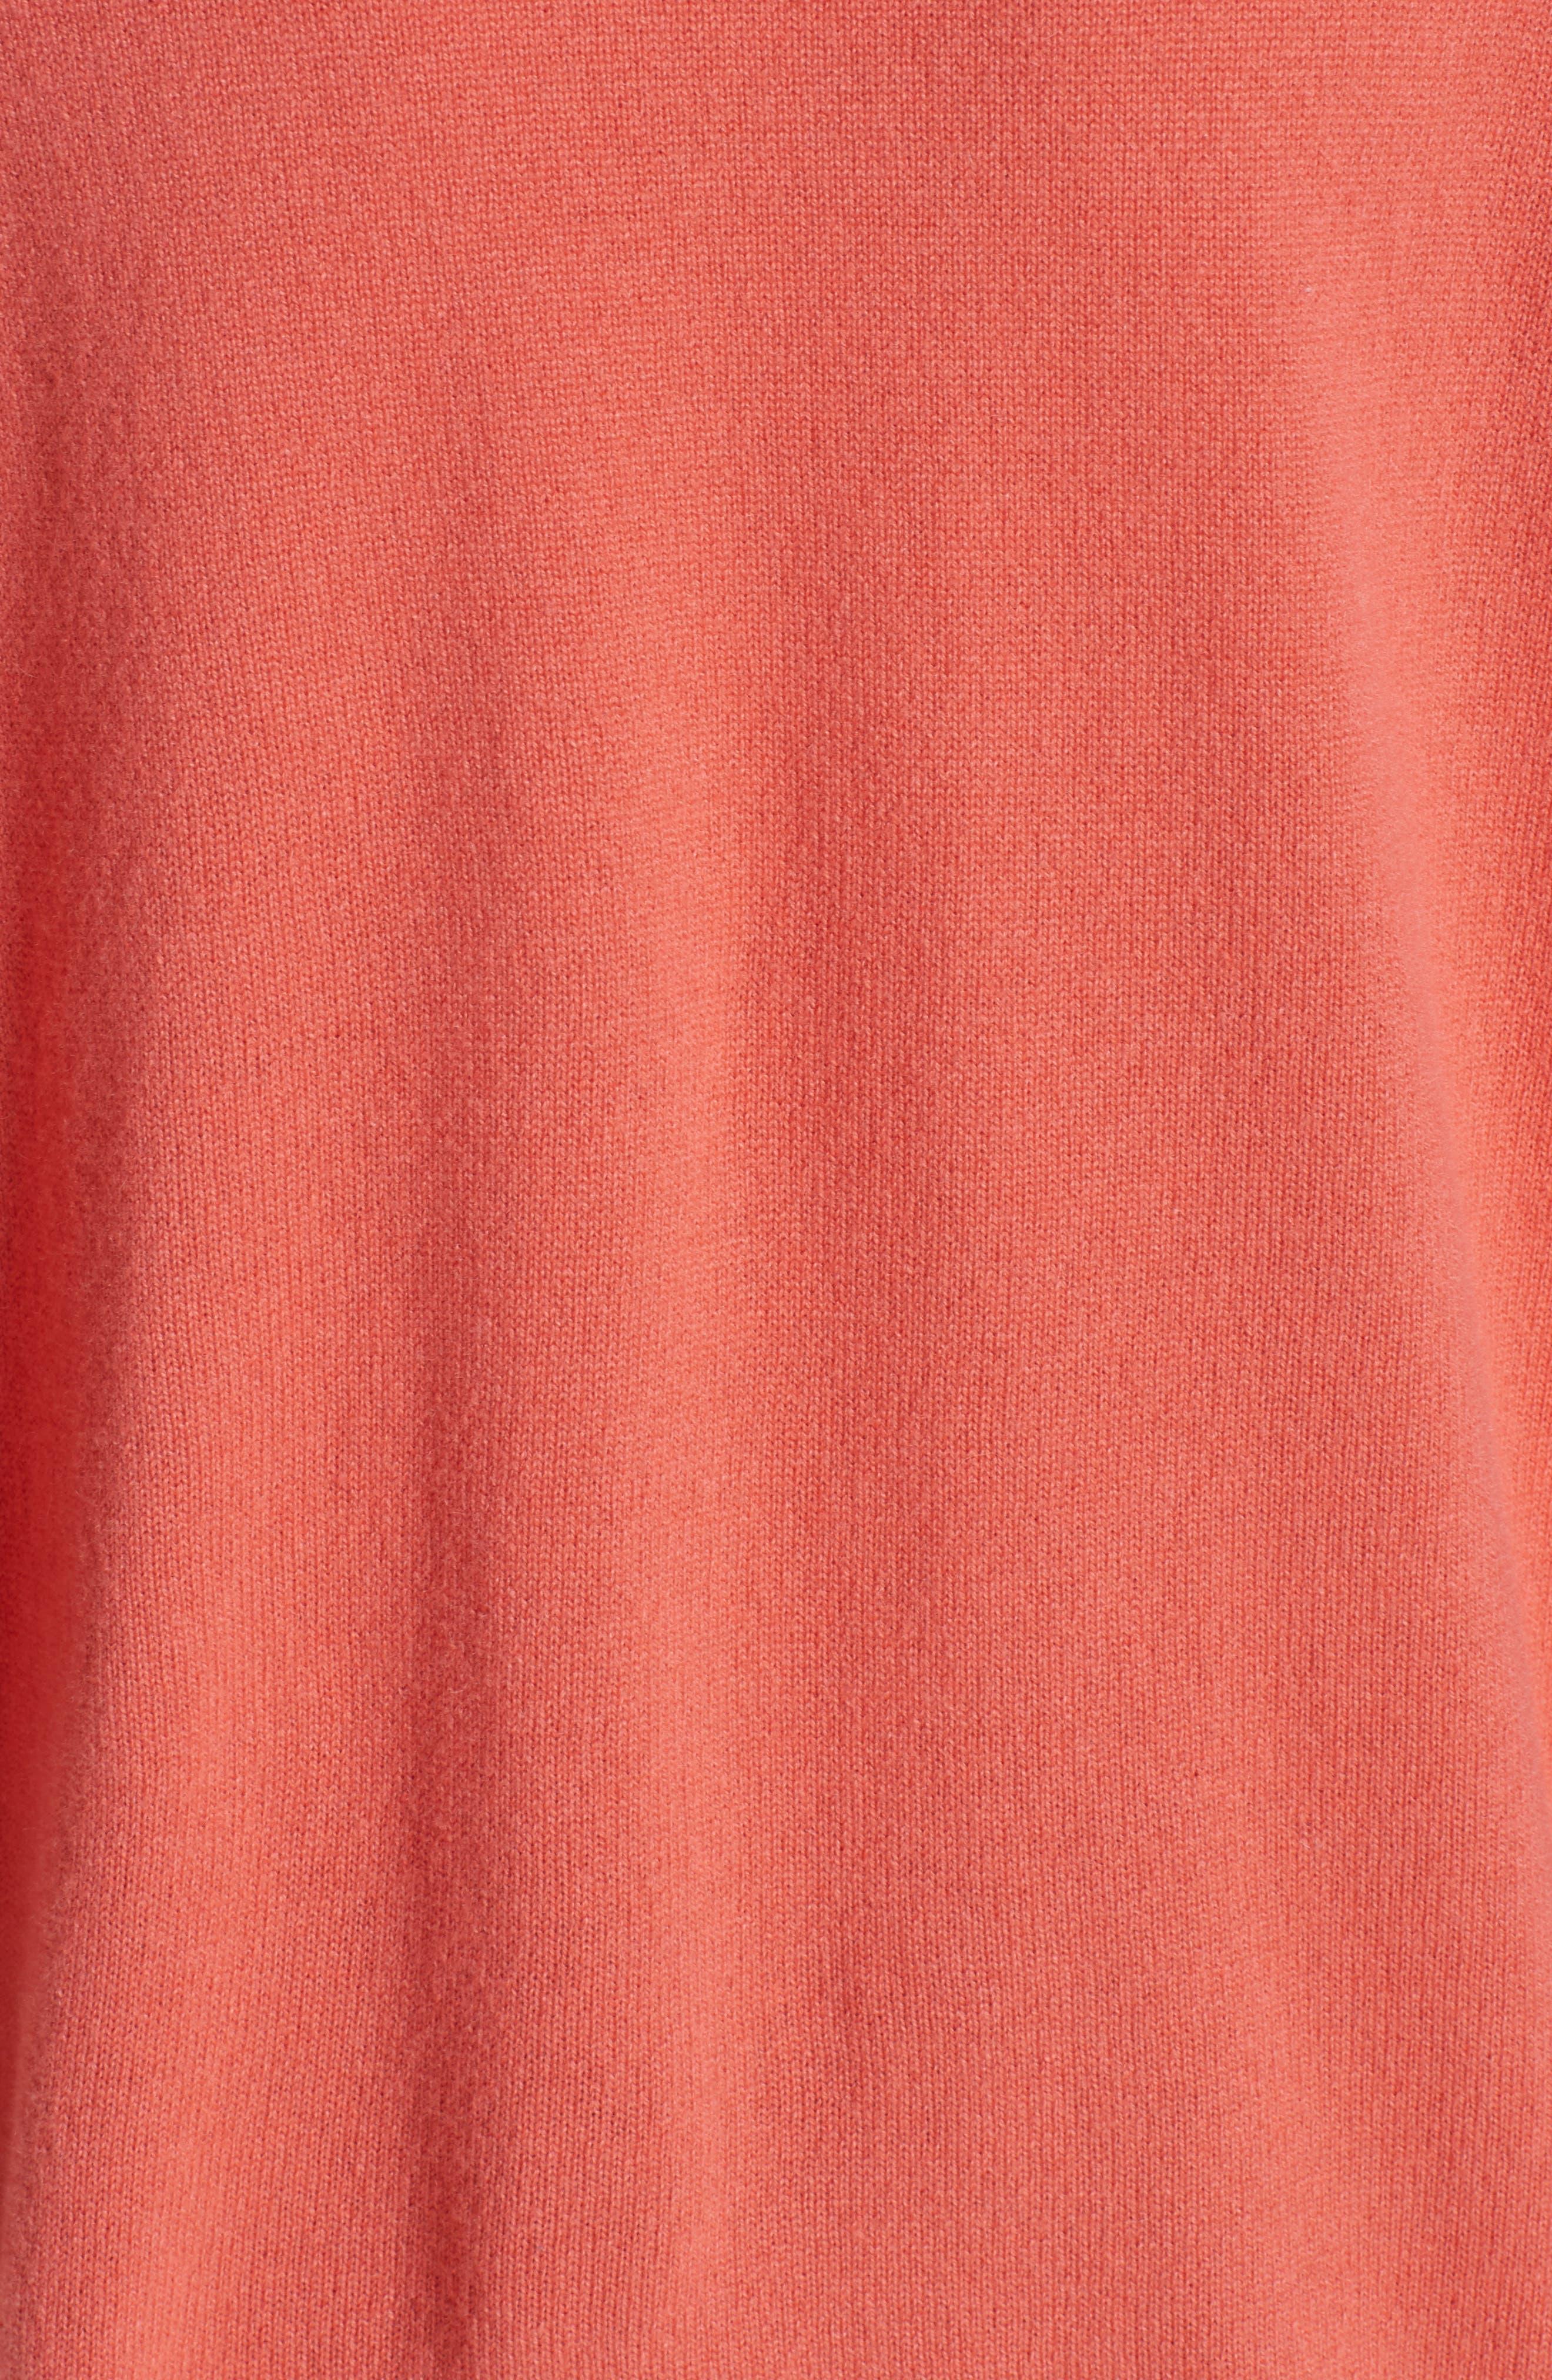 Stripe V-Neck Cashmere Sweater,                             Alternate thumbnail 5, color,                             ROSA NATURALE